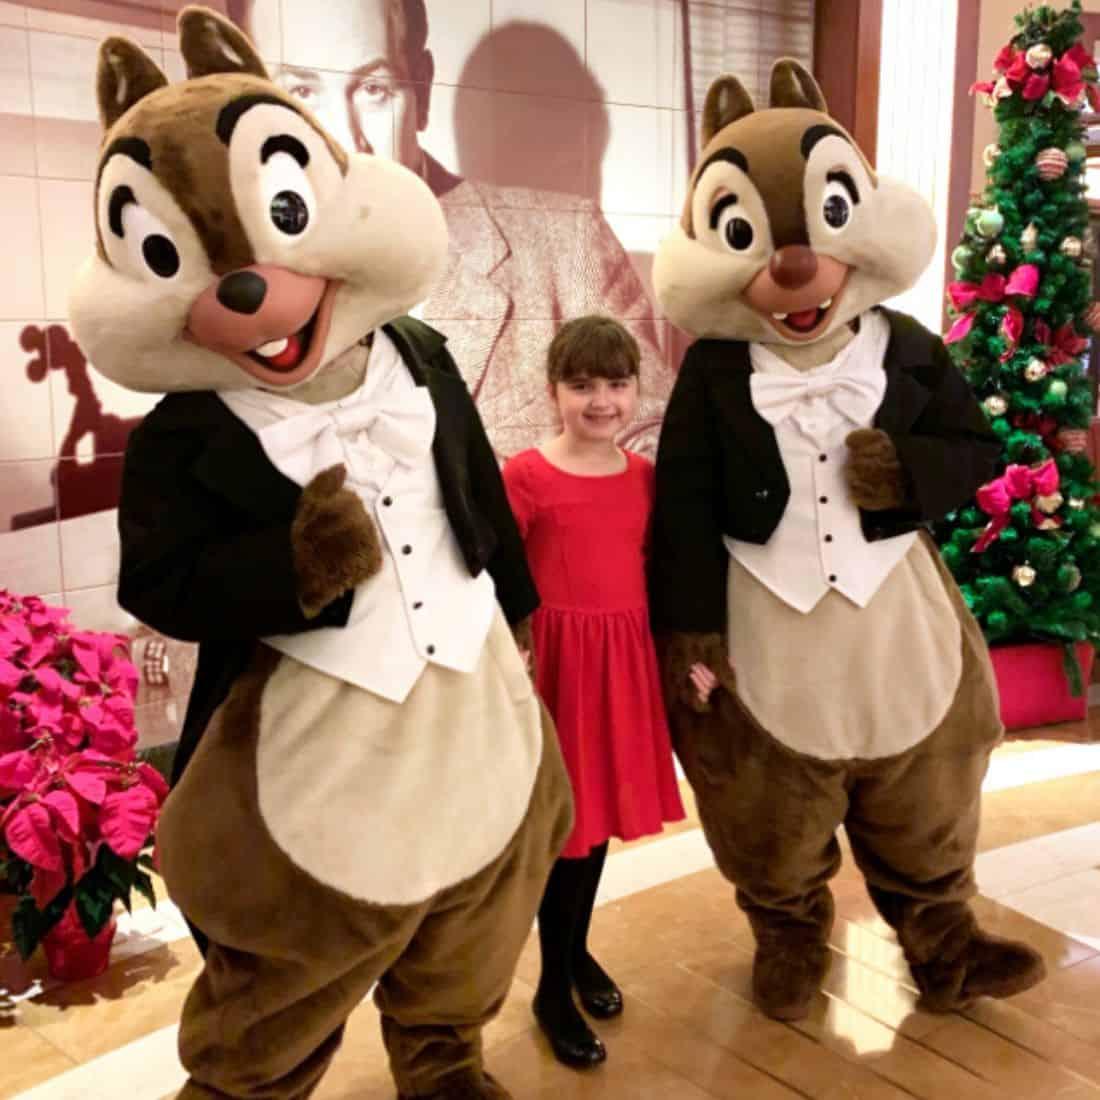 Disney Cruise Formal Night – What to Wear